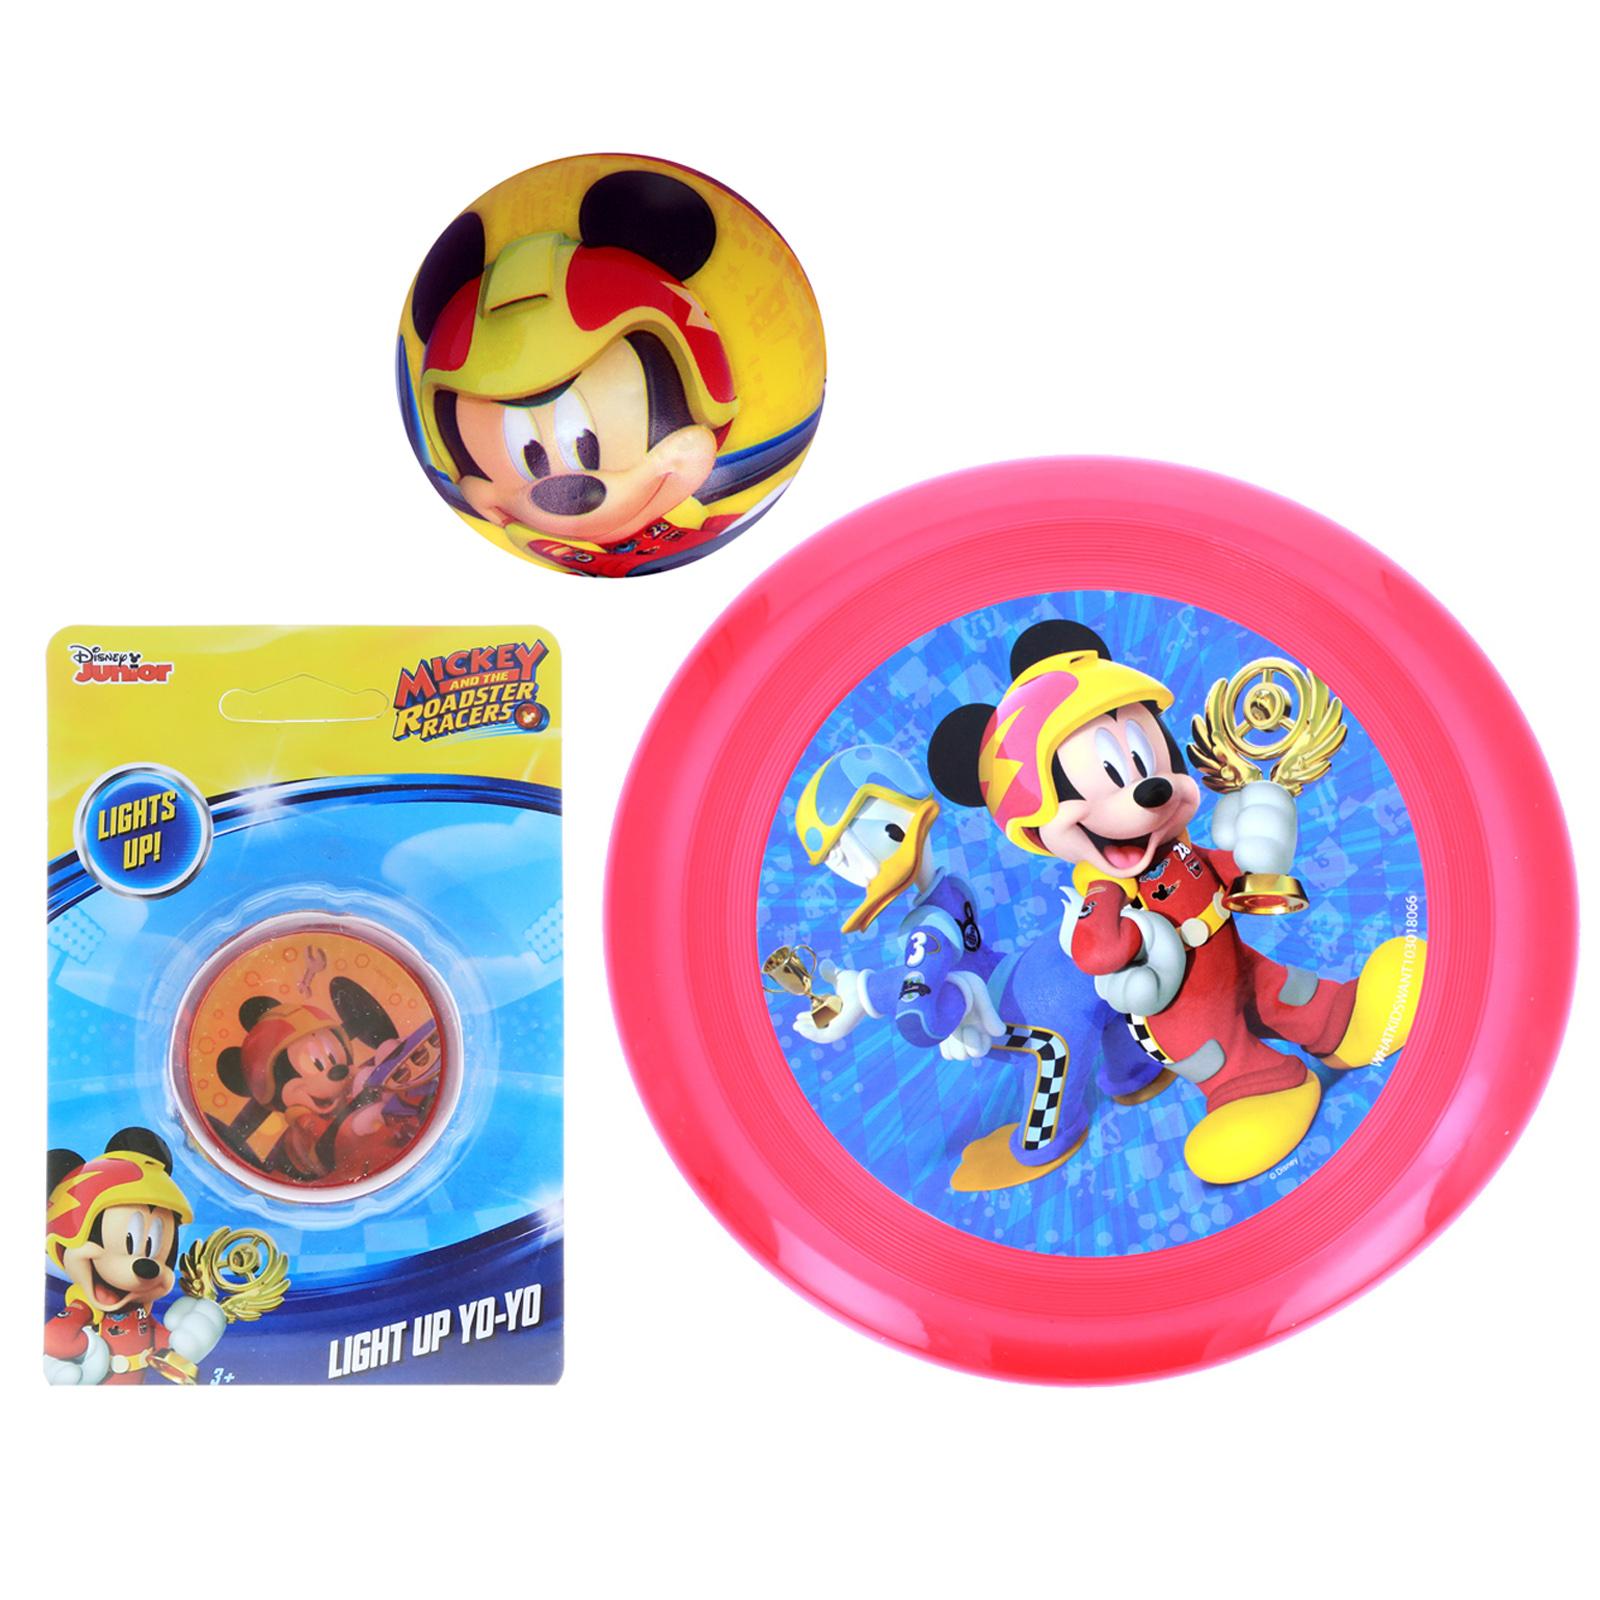 Mickey Mouse Kids Activity Game Gift Flying Disc Ball Yo-Yo